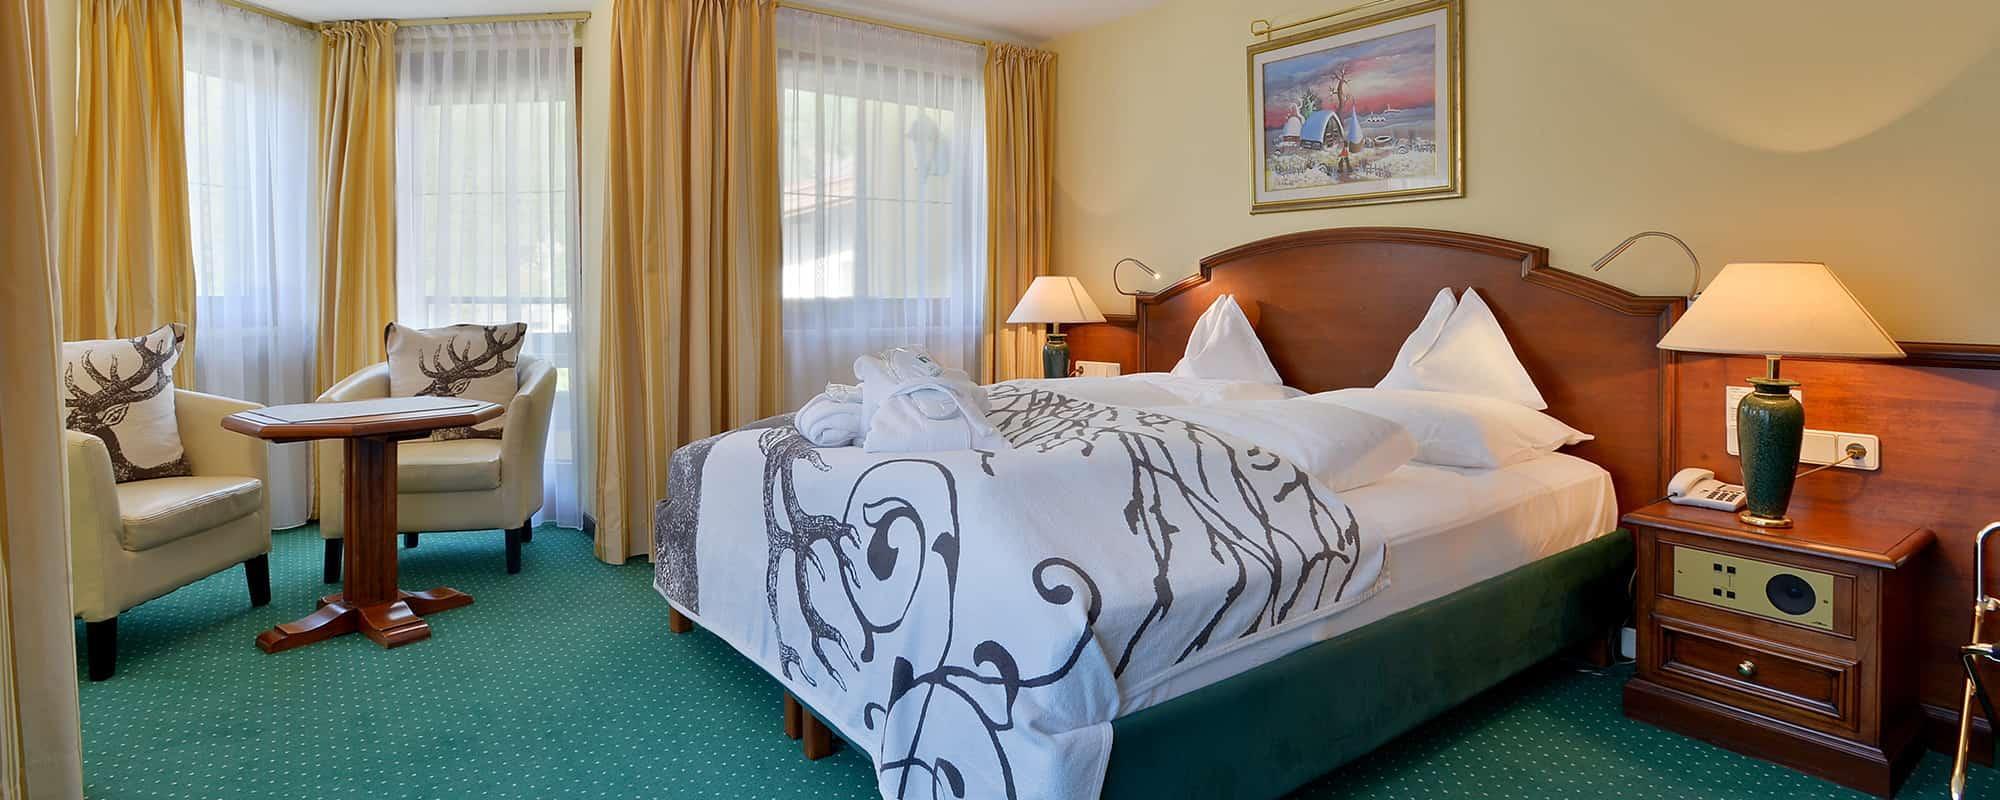 Manni Comfort Room Doppelbett